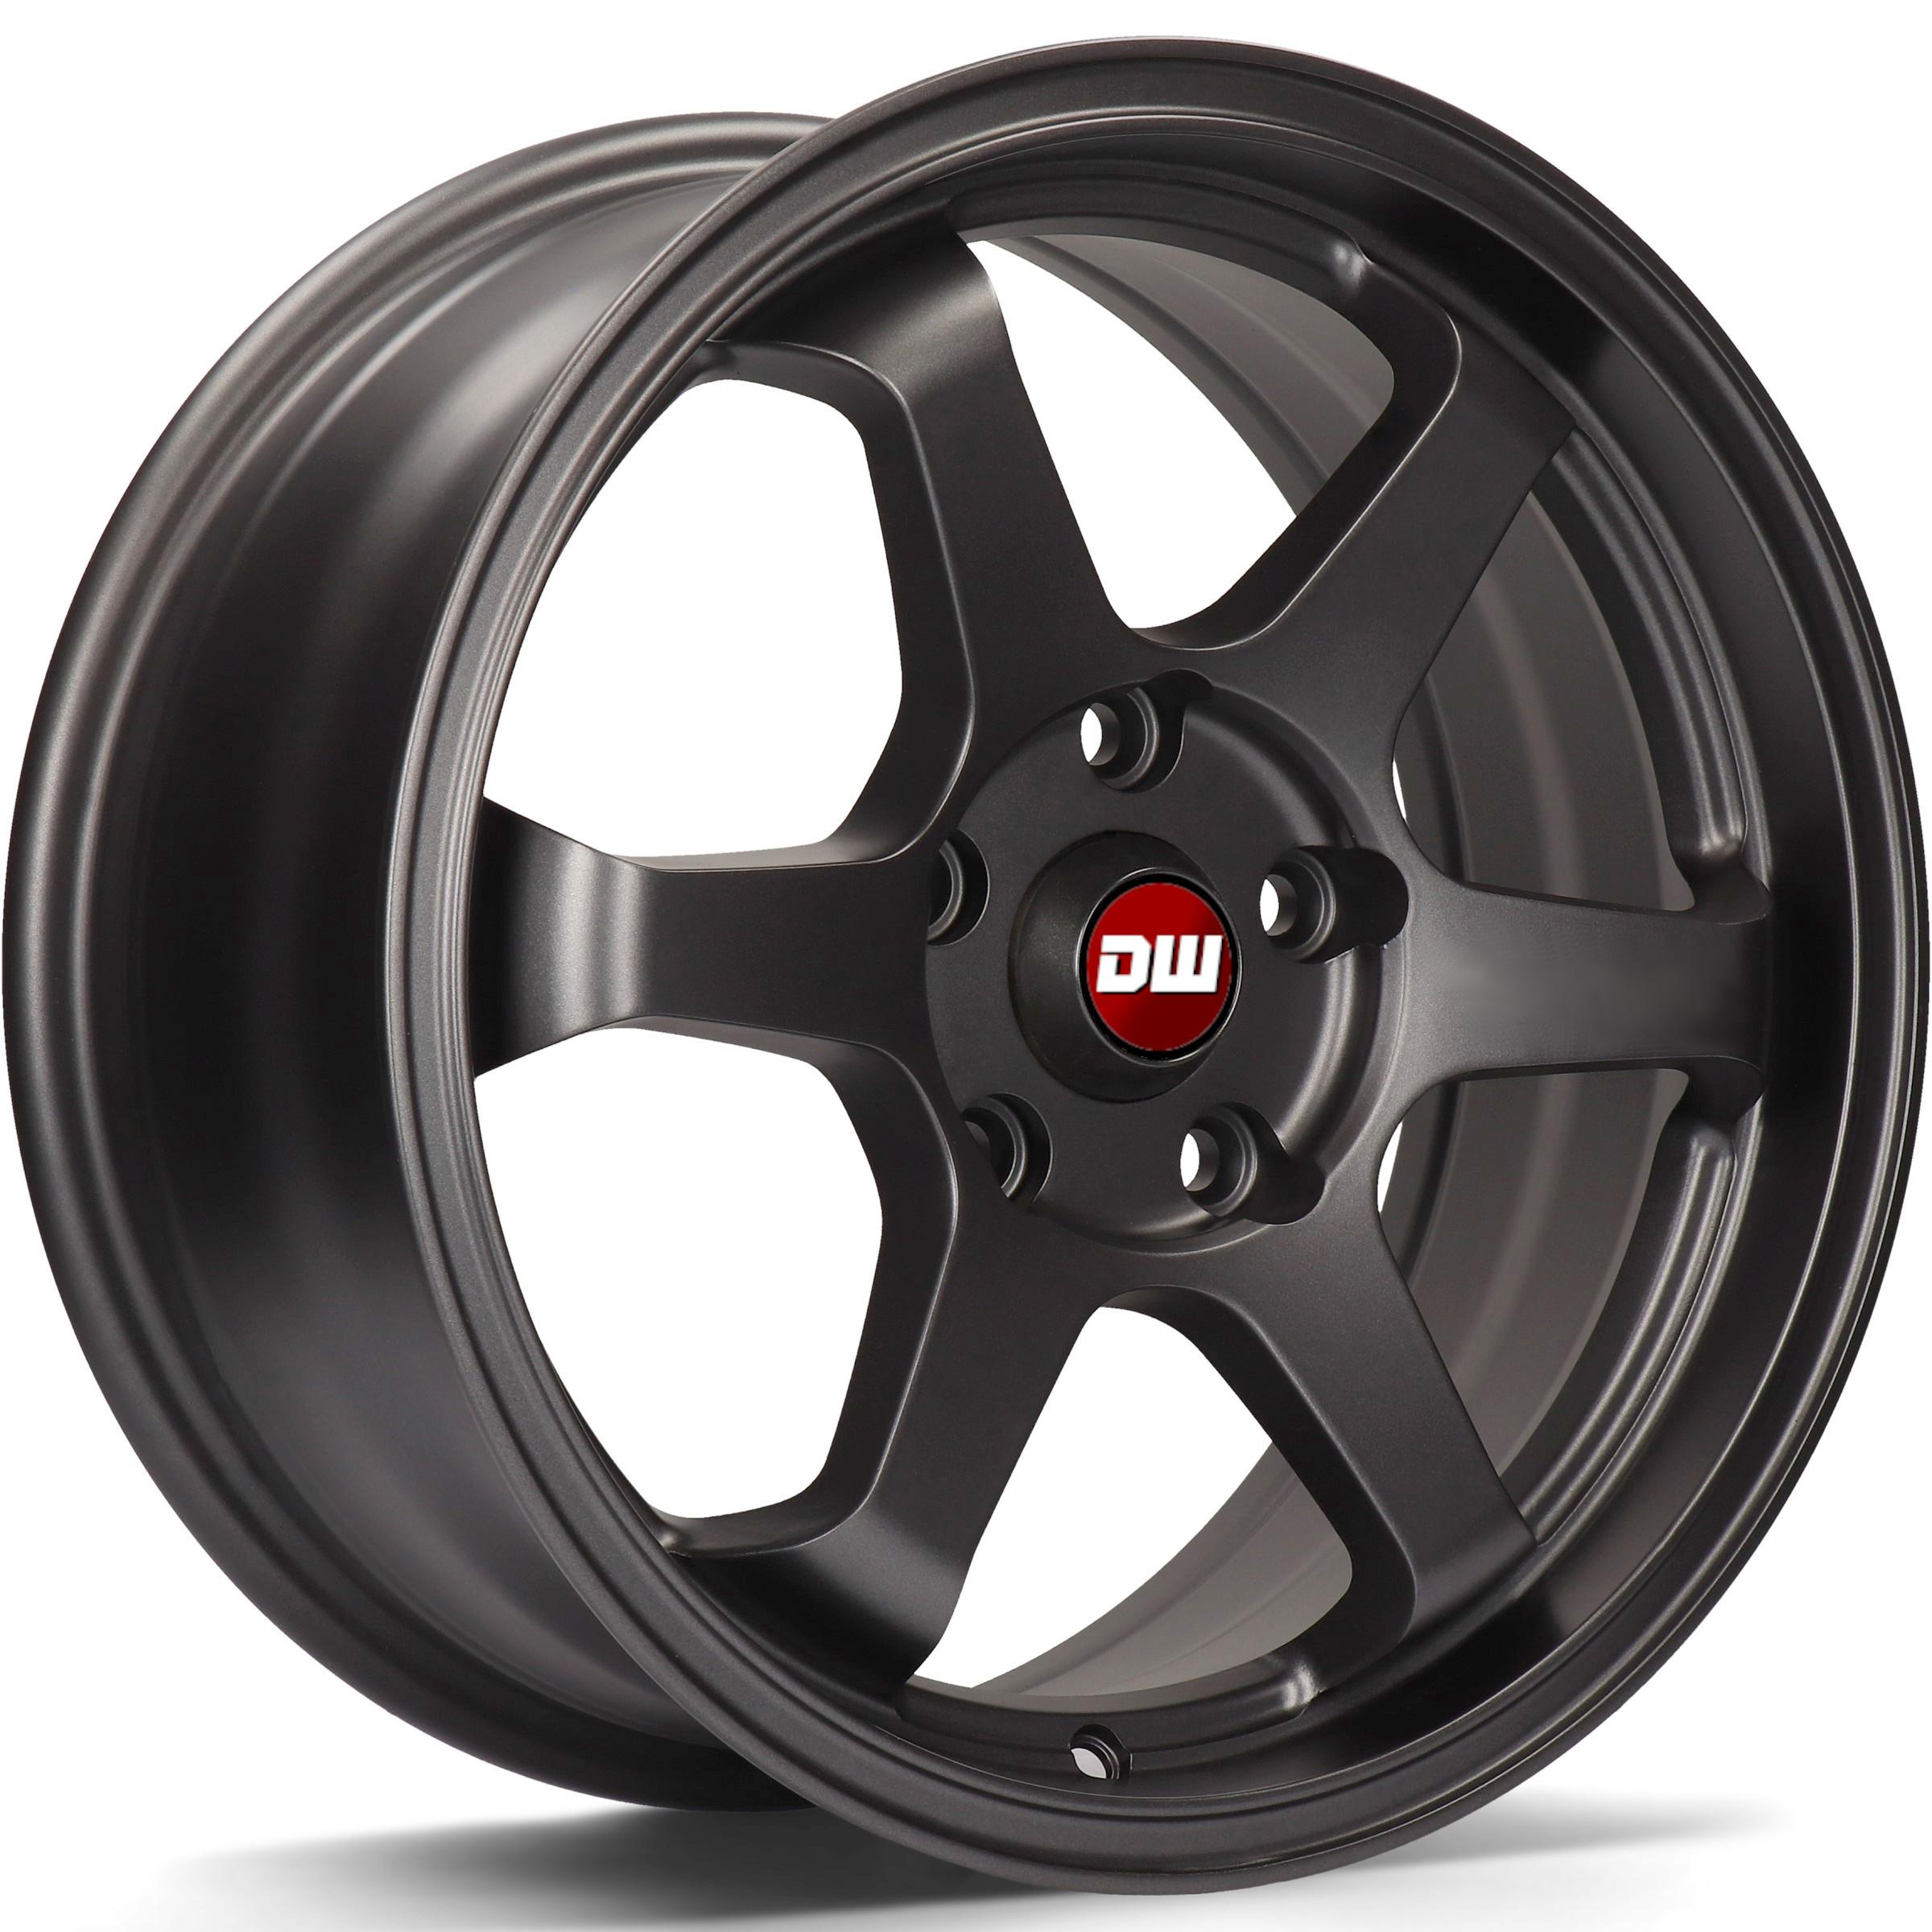 DW Wheels DWV-J Noir Gunmetal